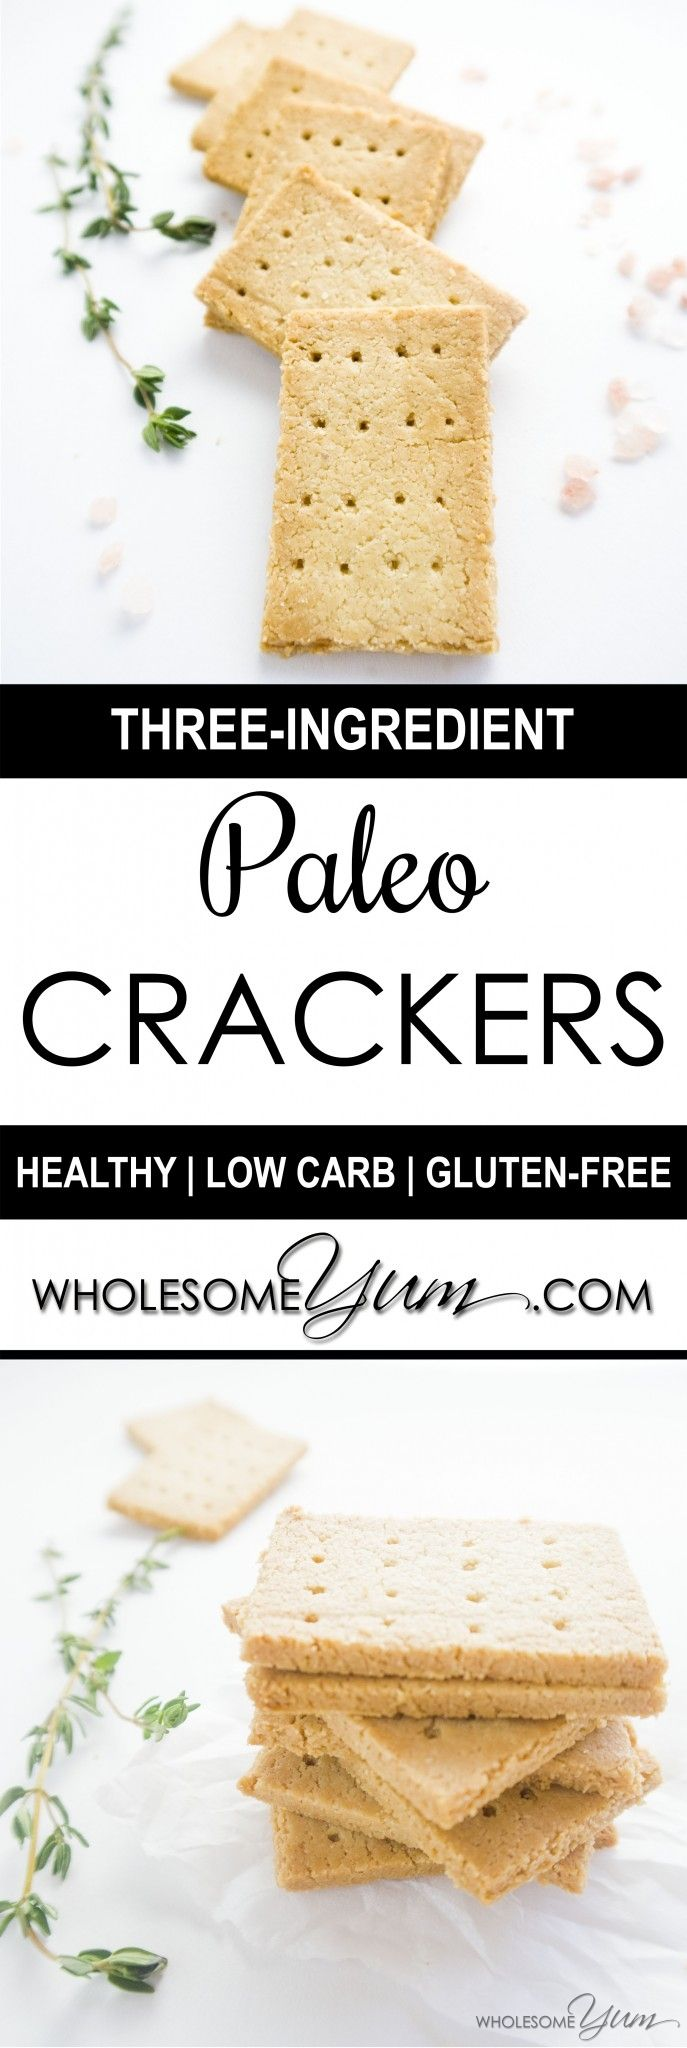 Three Ingredient Paleo Crackers Low Carb Gluten Free